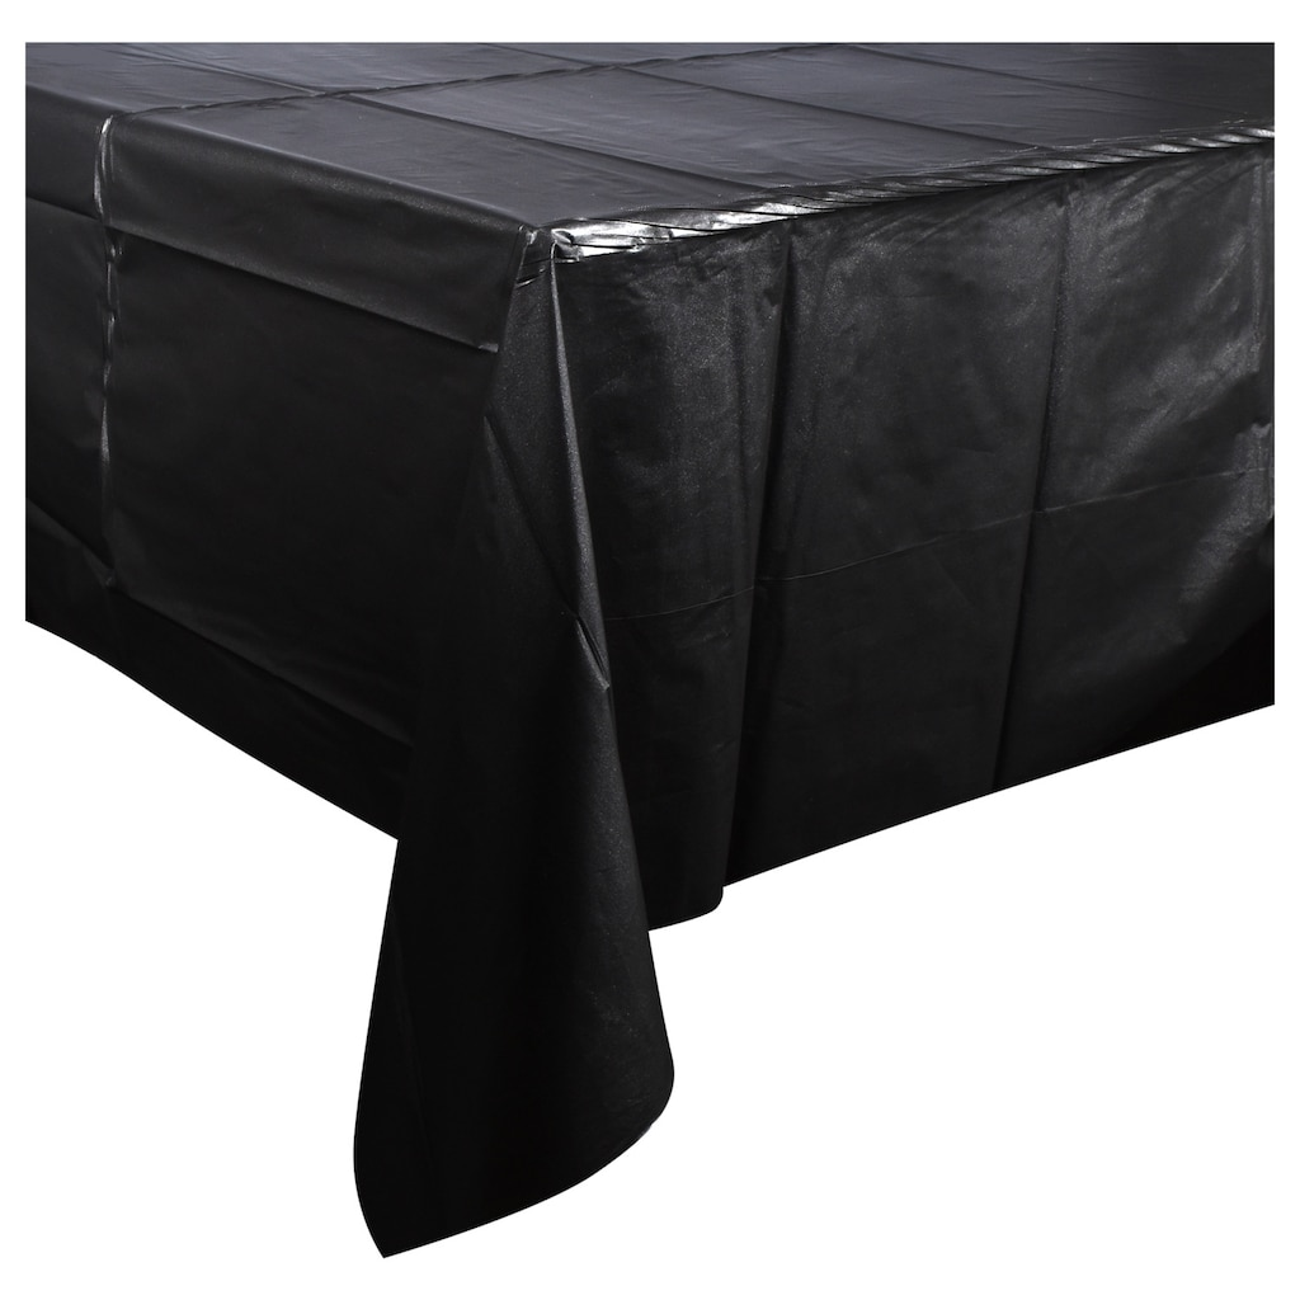 Black Tablecloth Dollar Tree Inc